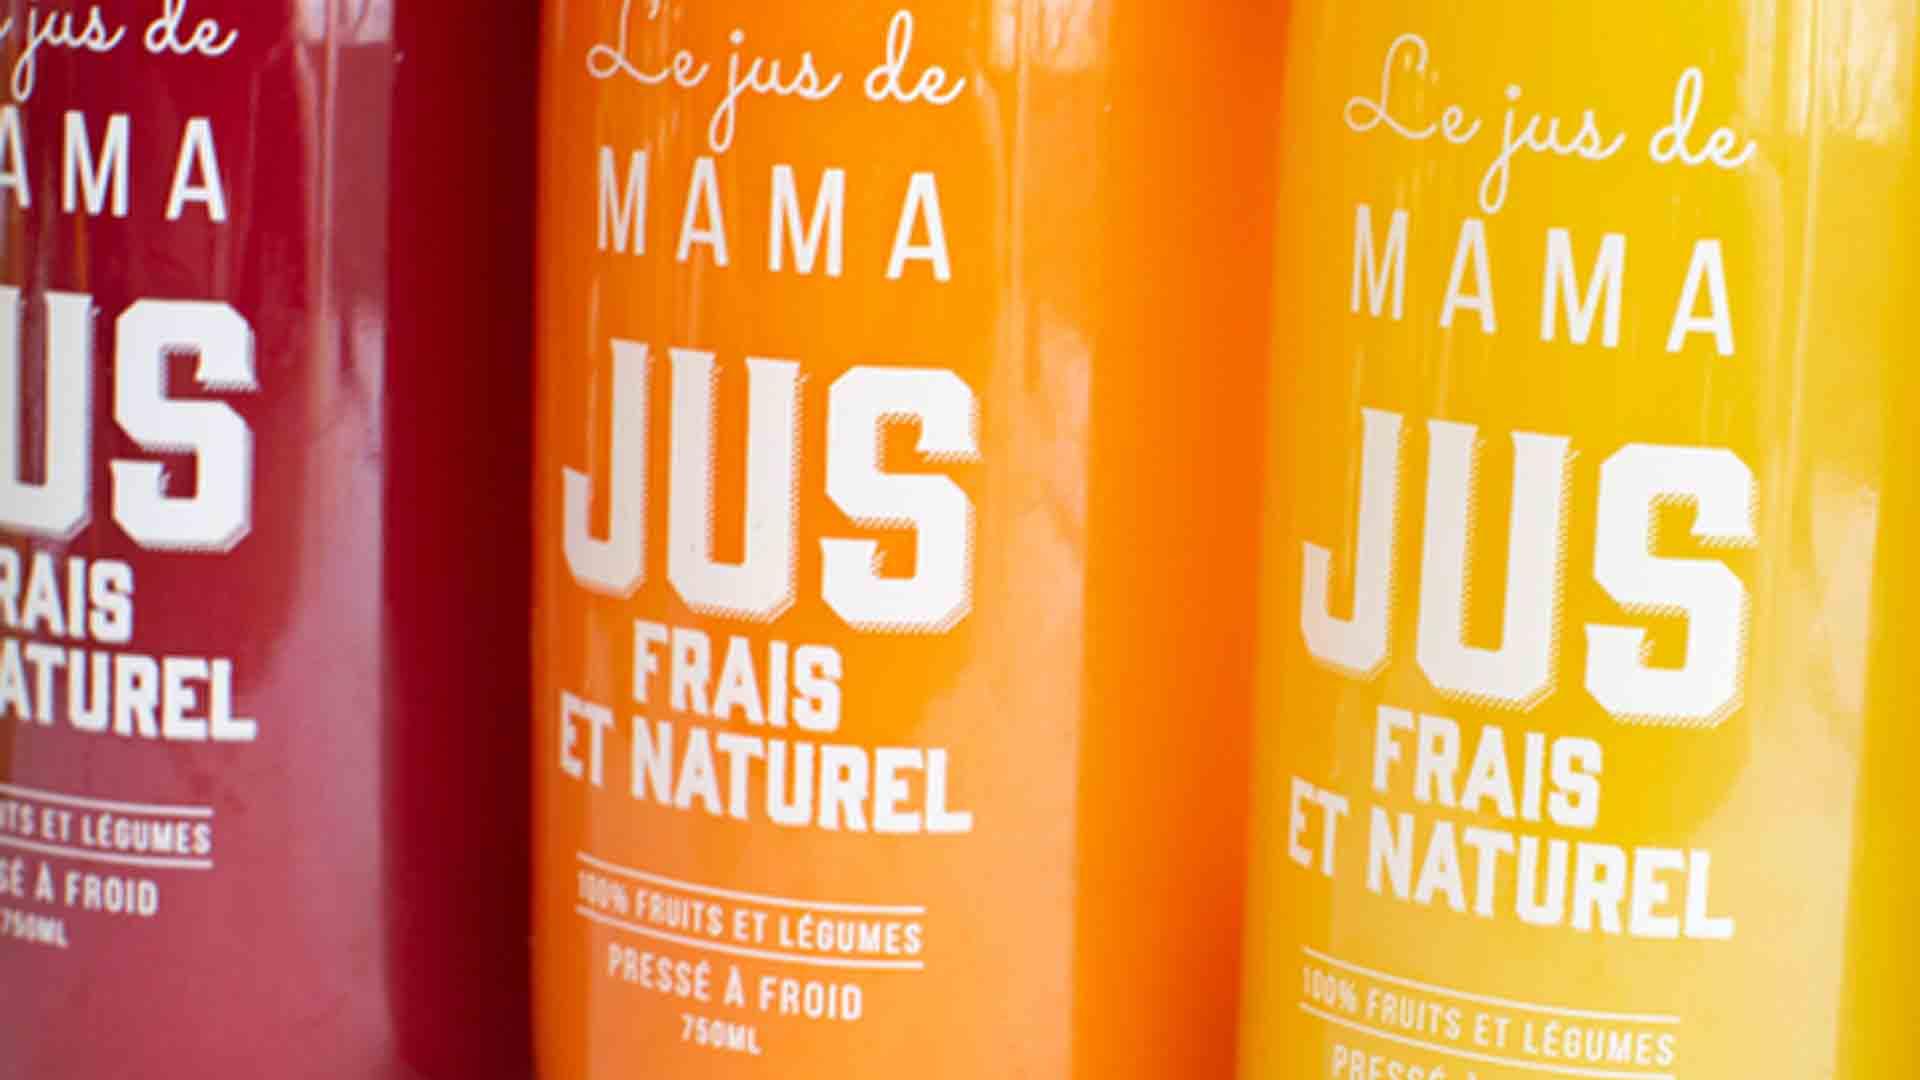 Jus de Mama jus de fruit naturel bouteille consignée eco responsable